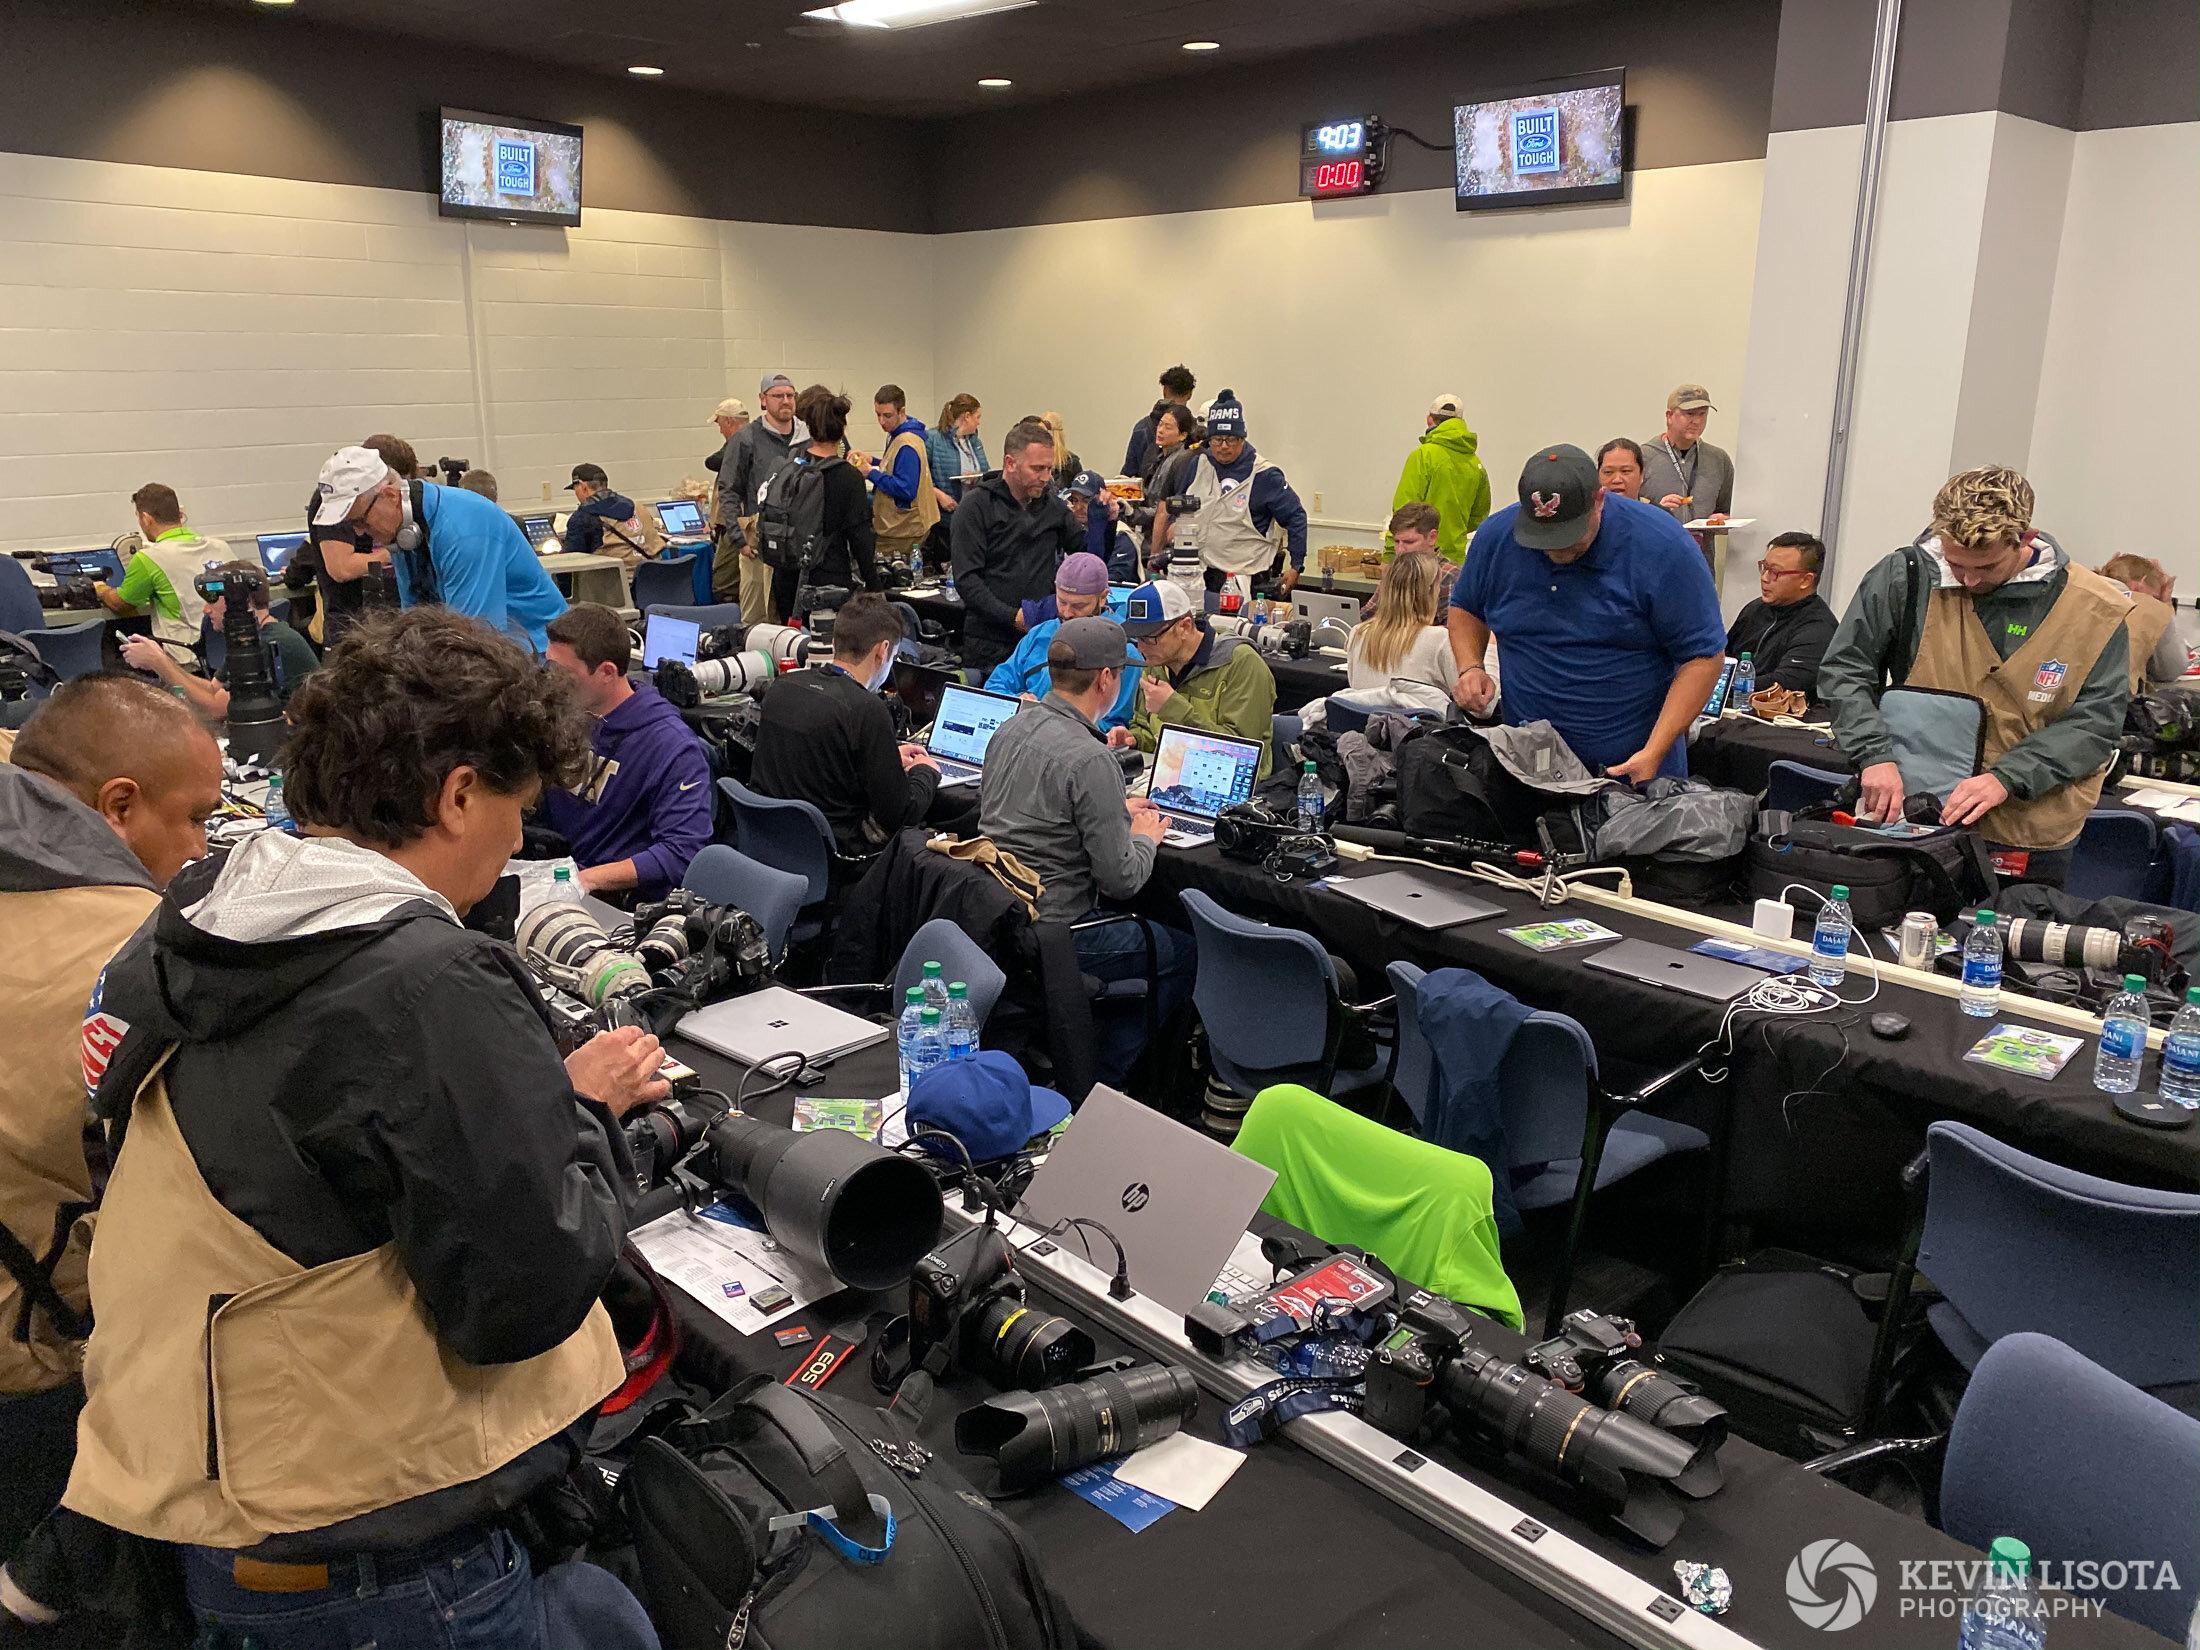 Photographers work room at Centurylink Field